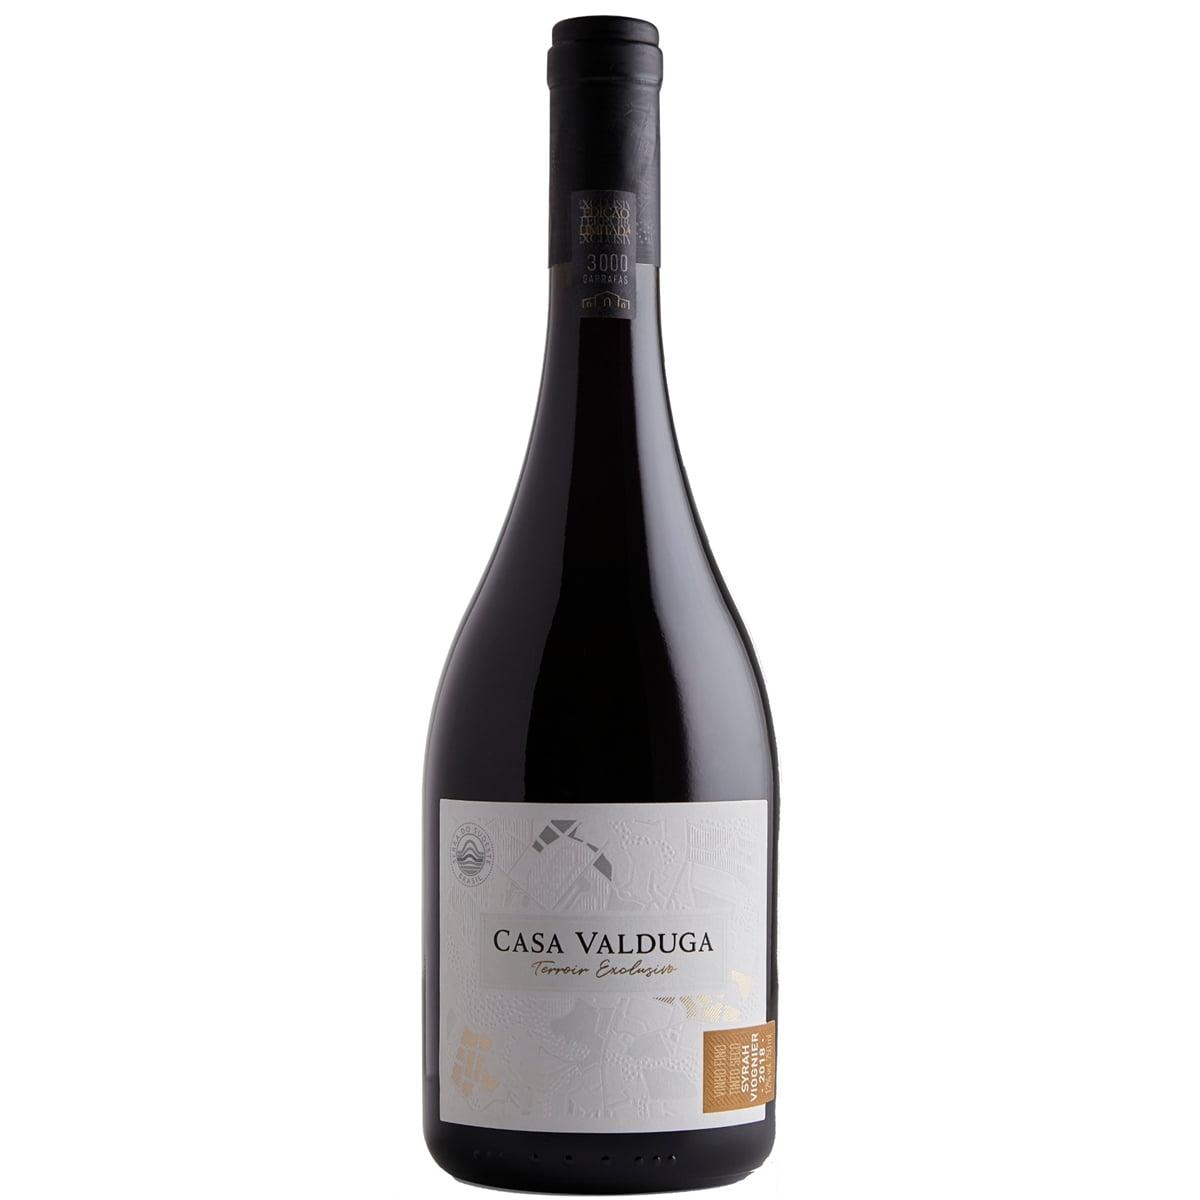 Vinho Casa Valduga Terroir Exclusivo Syrah/Viognier Tinto Seco 750ml